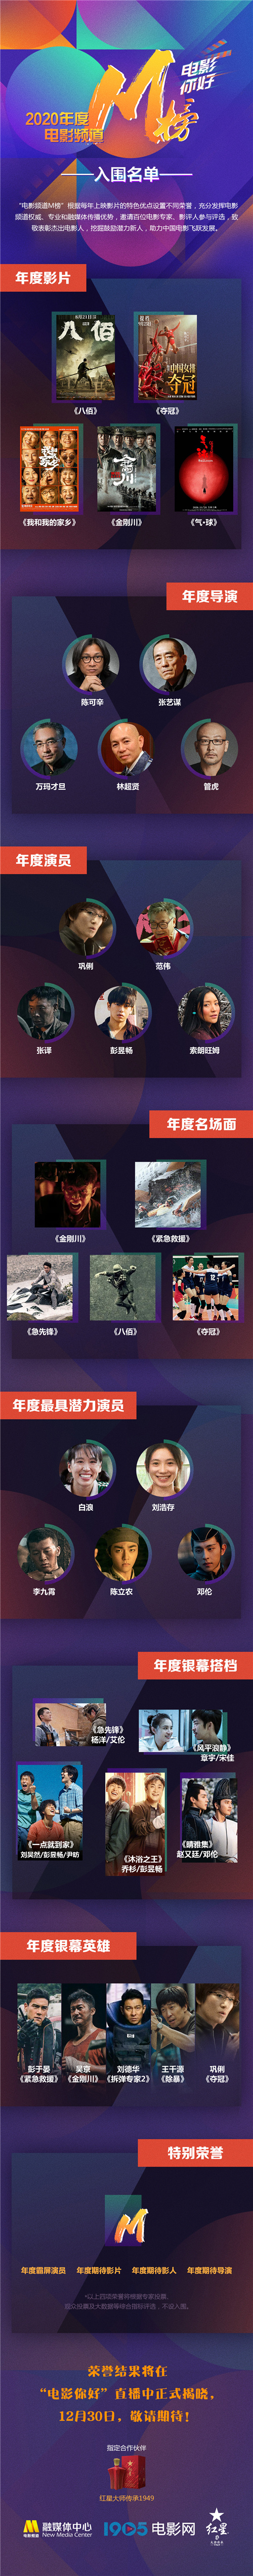 usdt不用实名(caibao.it):2020年电影频道M榜入围名单出炉 巩俐范伟等竞逐 第10张